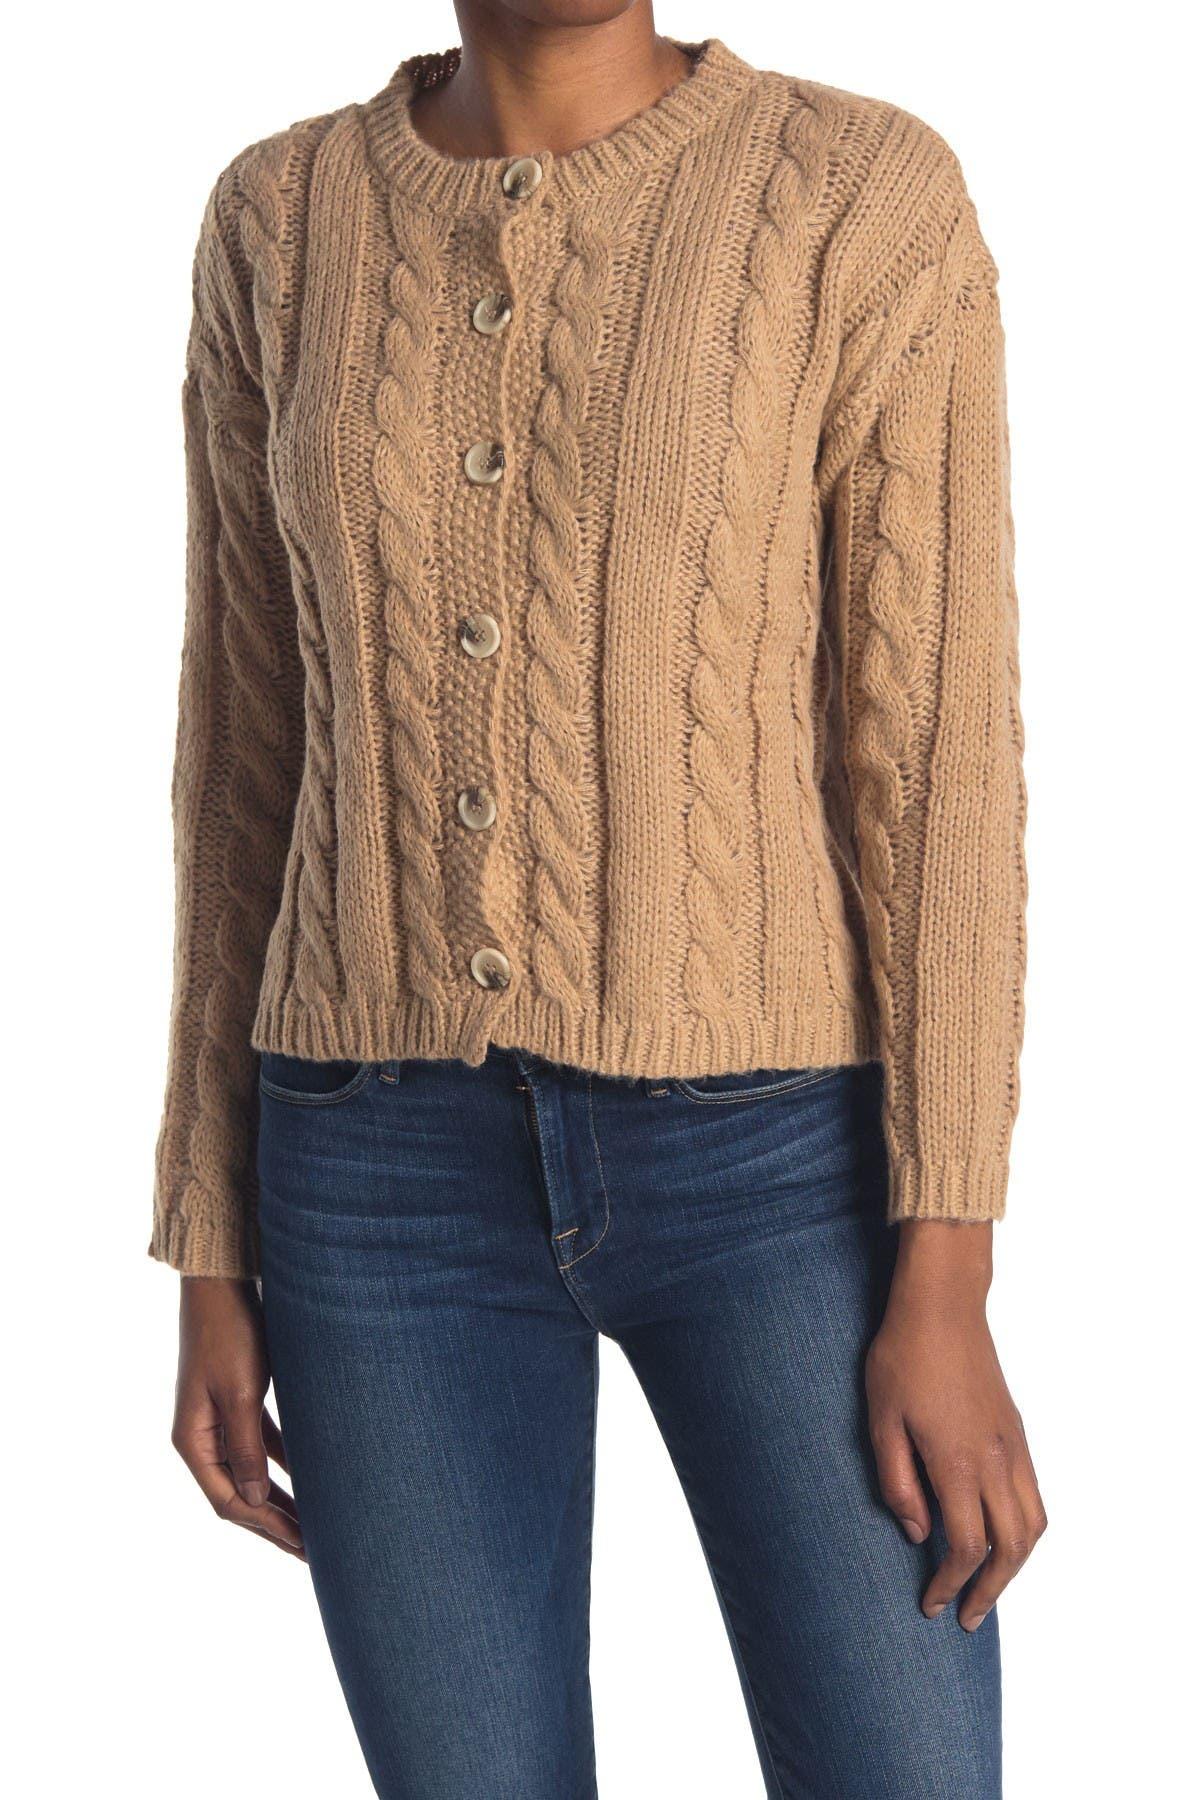 Image of Cotton Emporium Cable Knit Button Front Cardigan